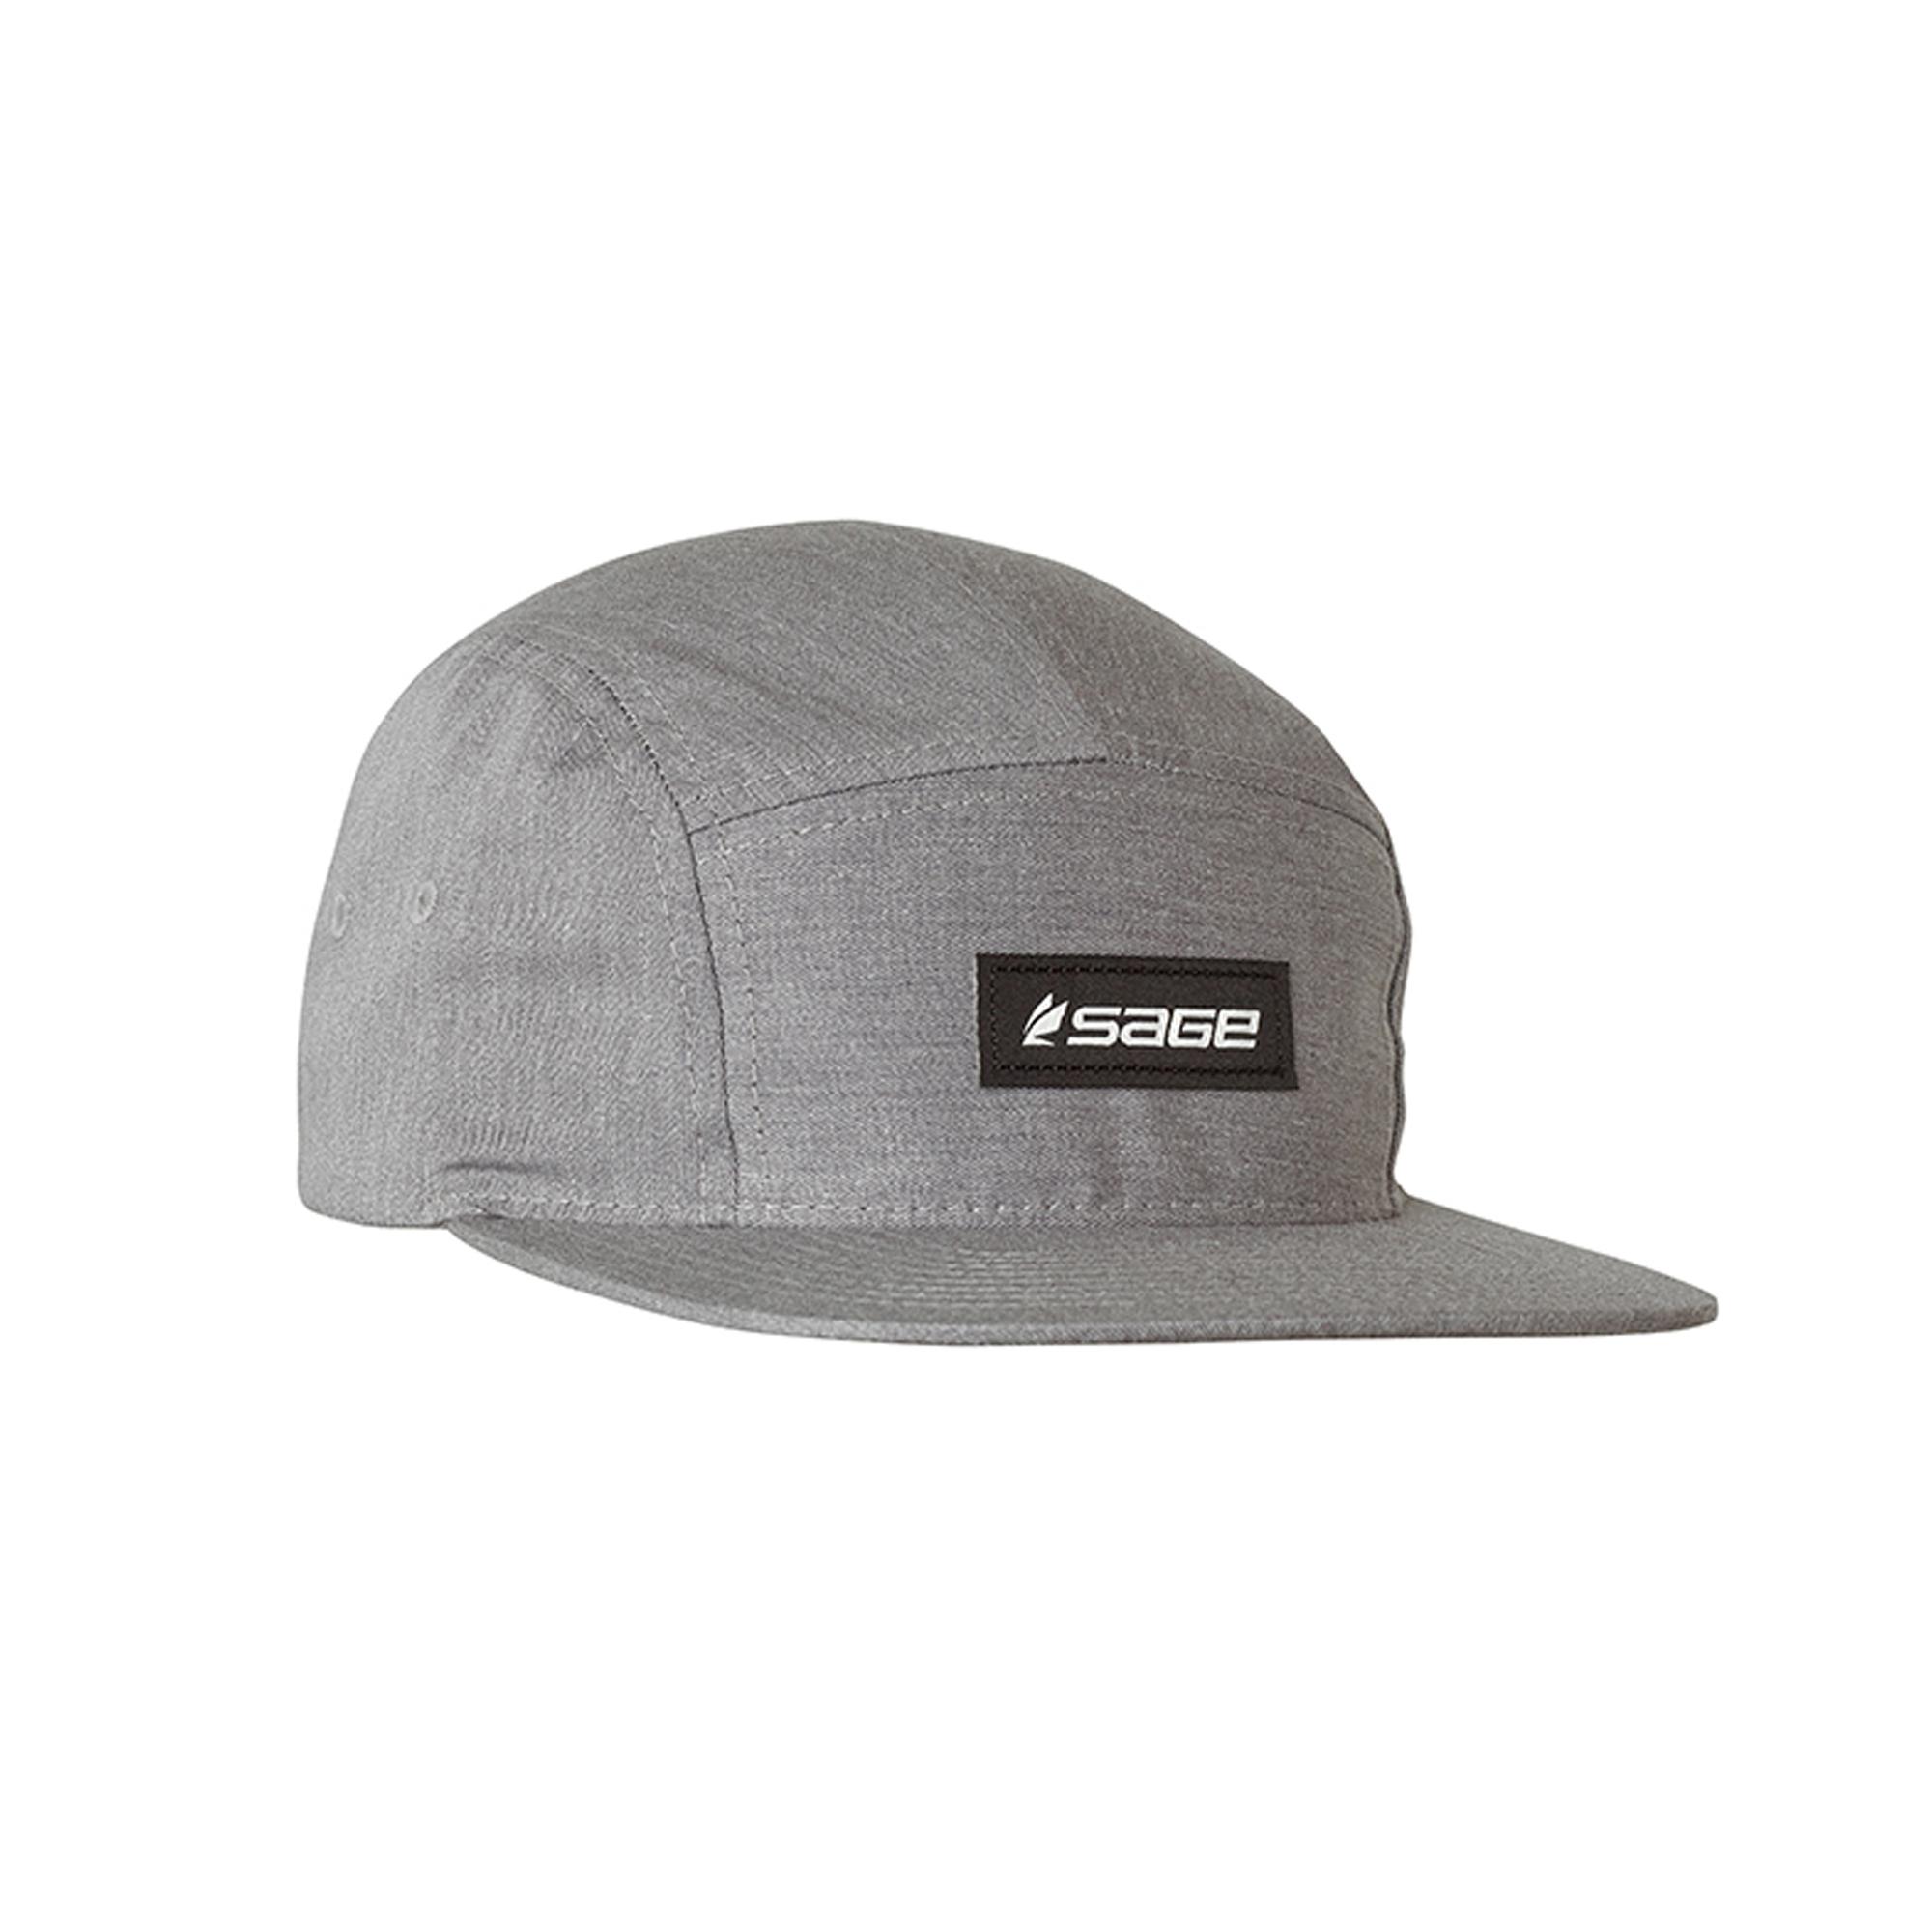 sage-highland-cap-grey